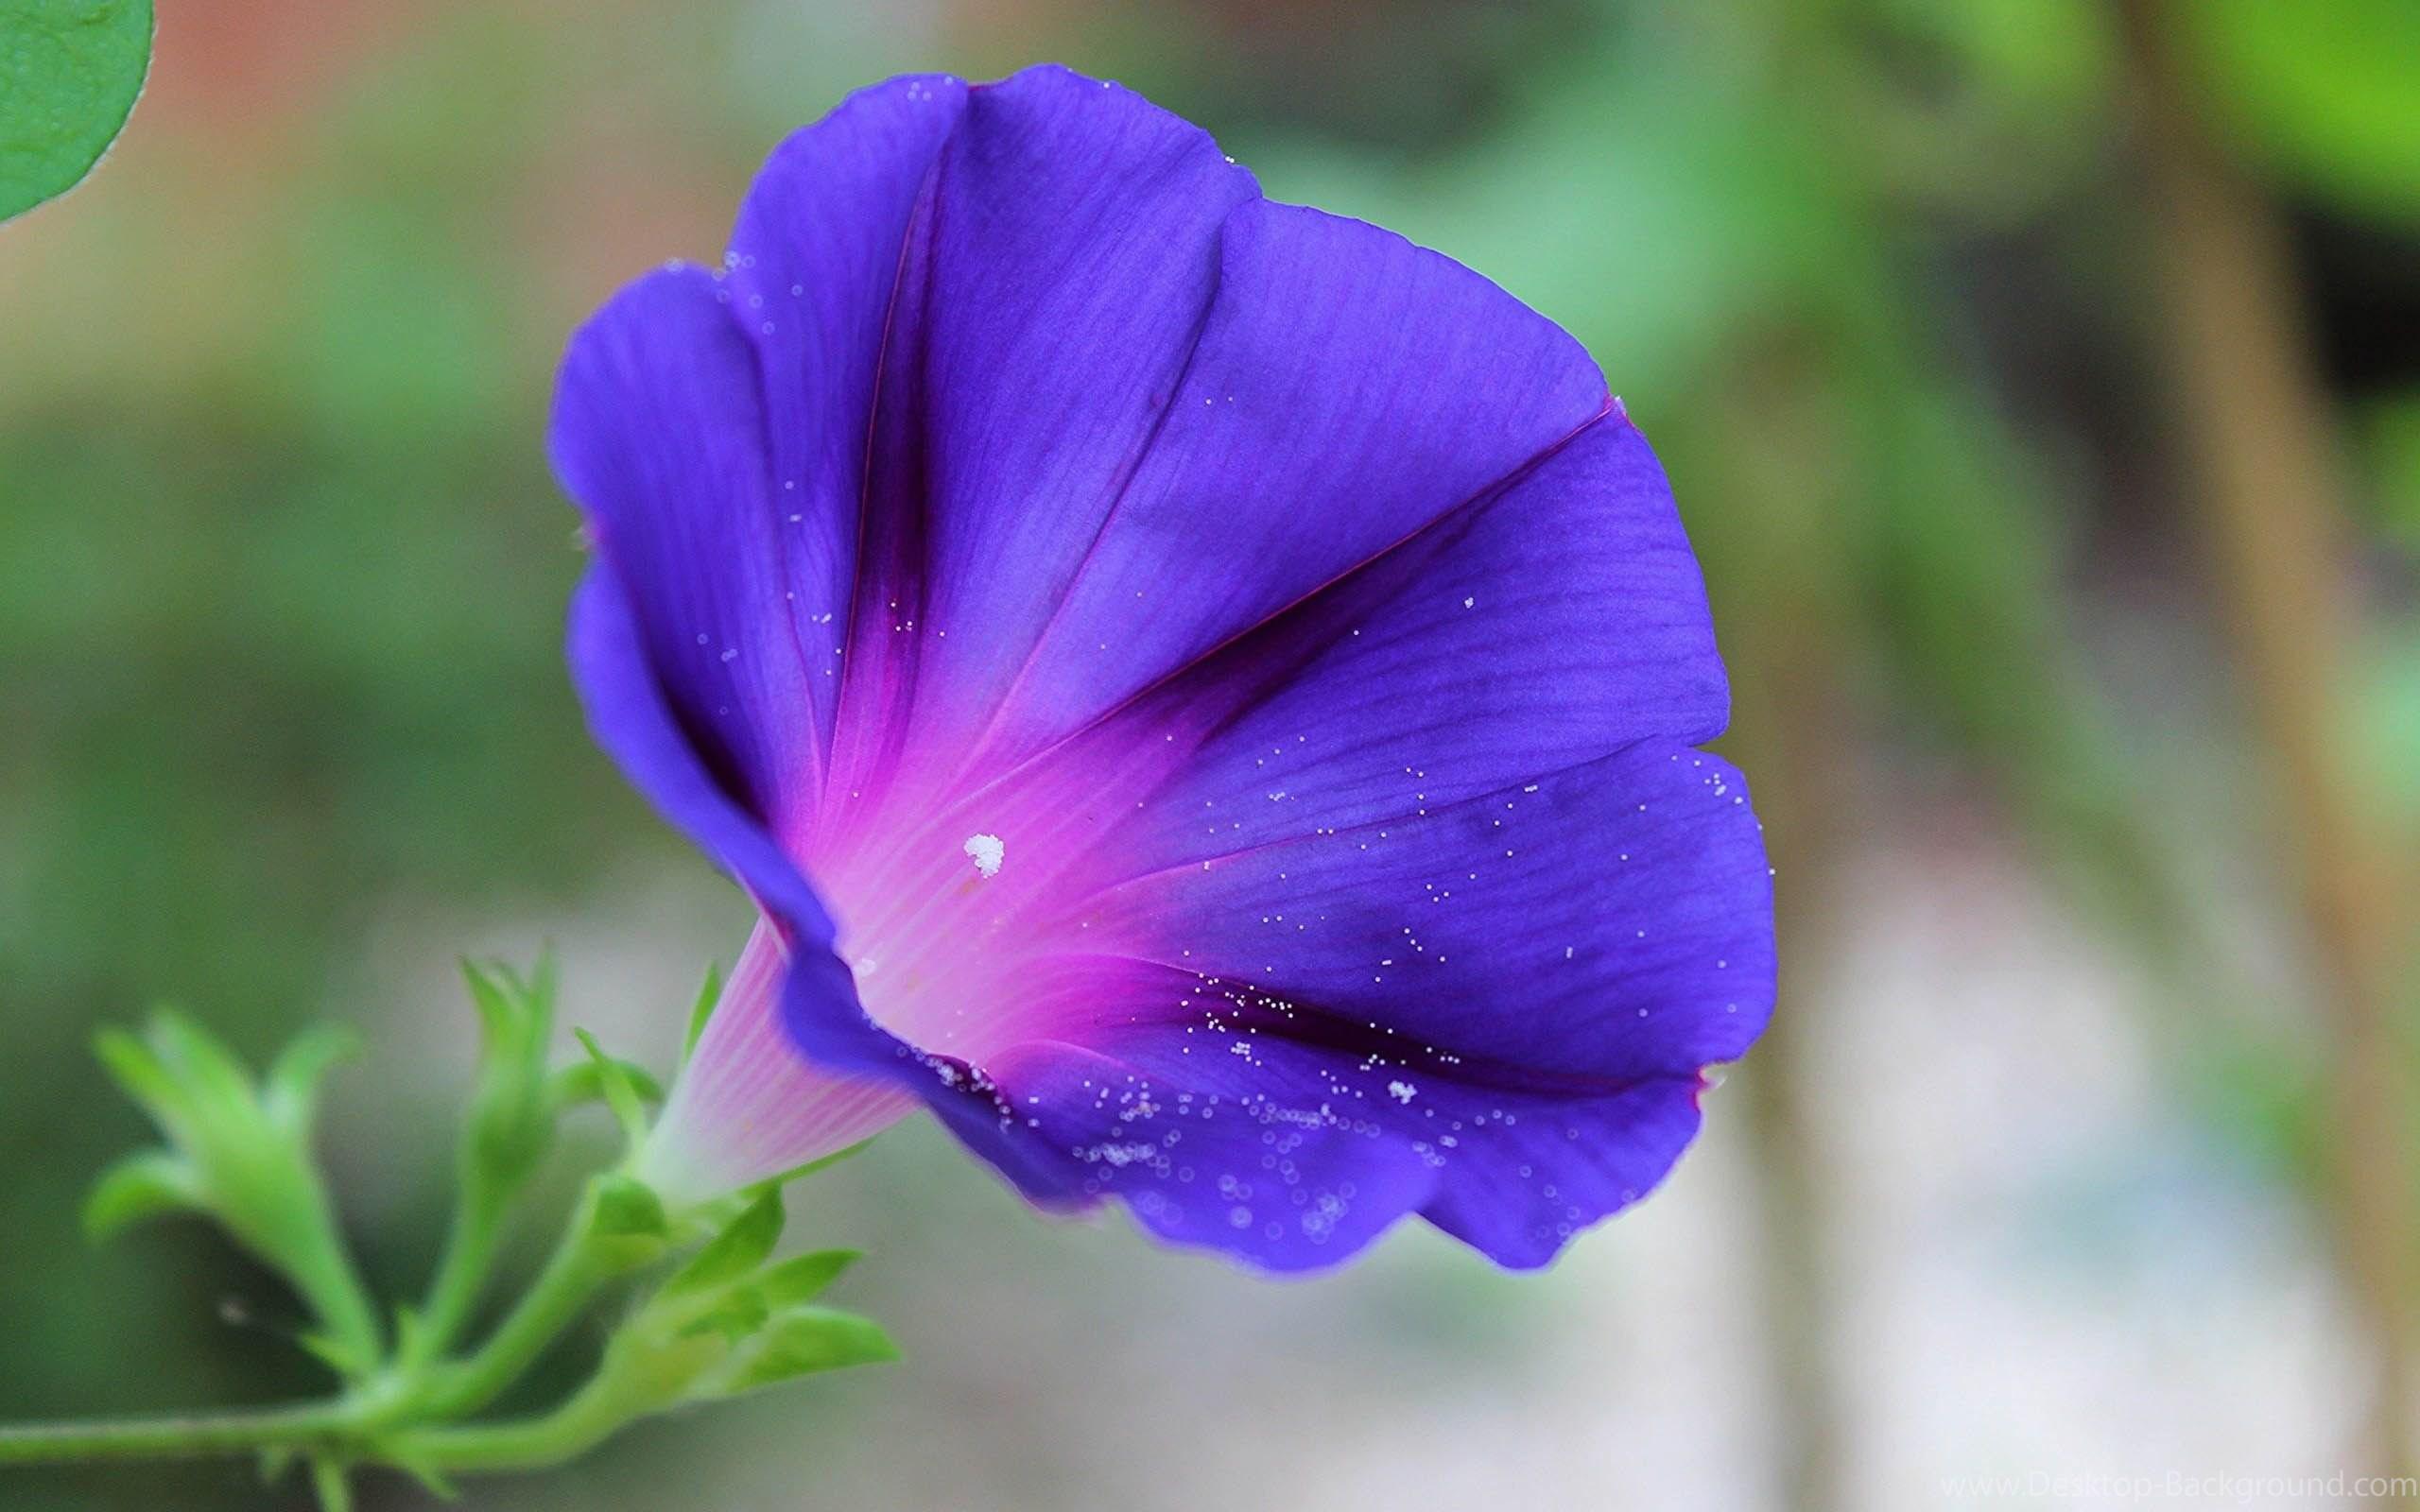 Original Size - Bluebells Flower Images Hd , HD Wallpaper & Backgrounds